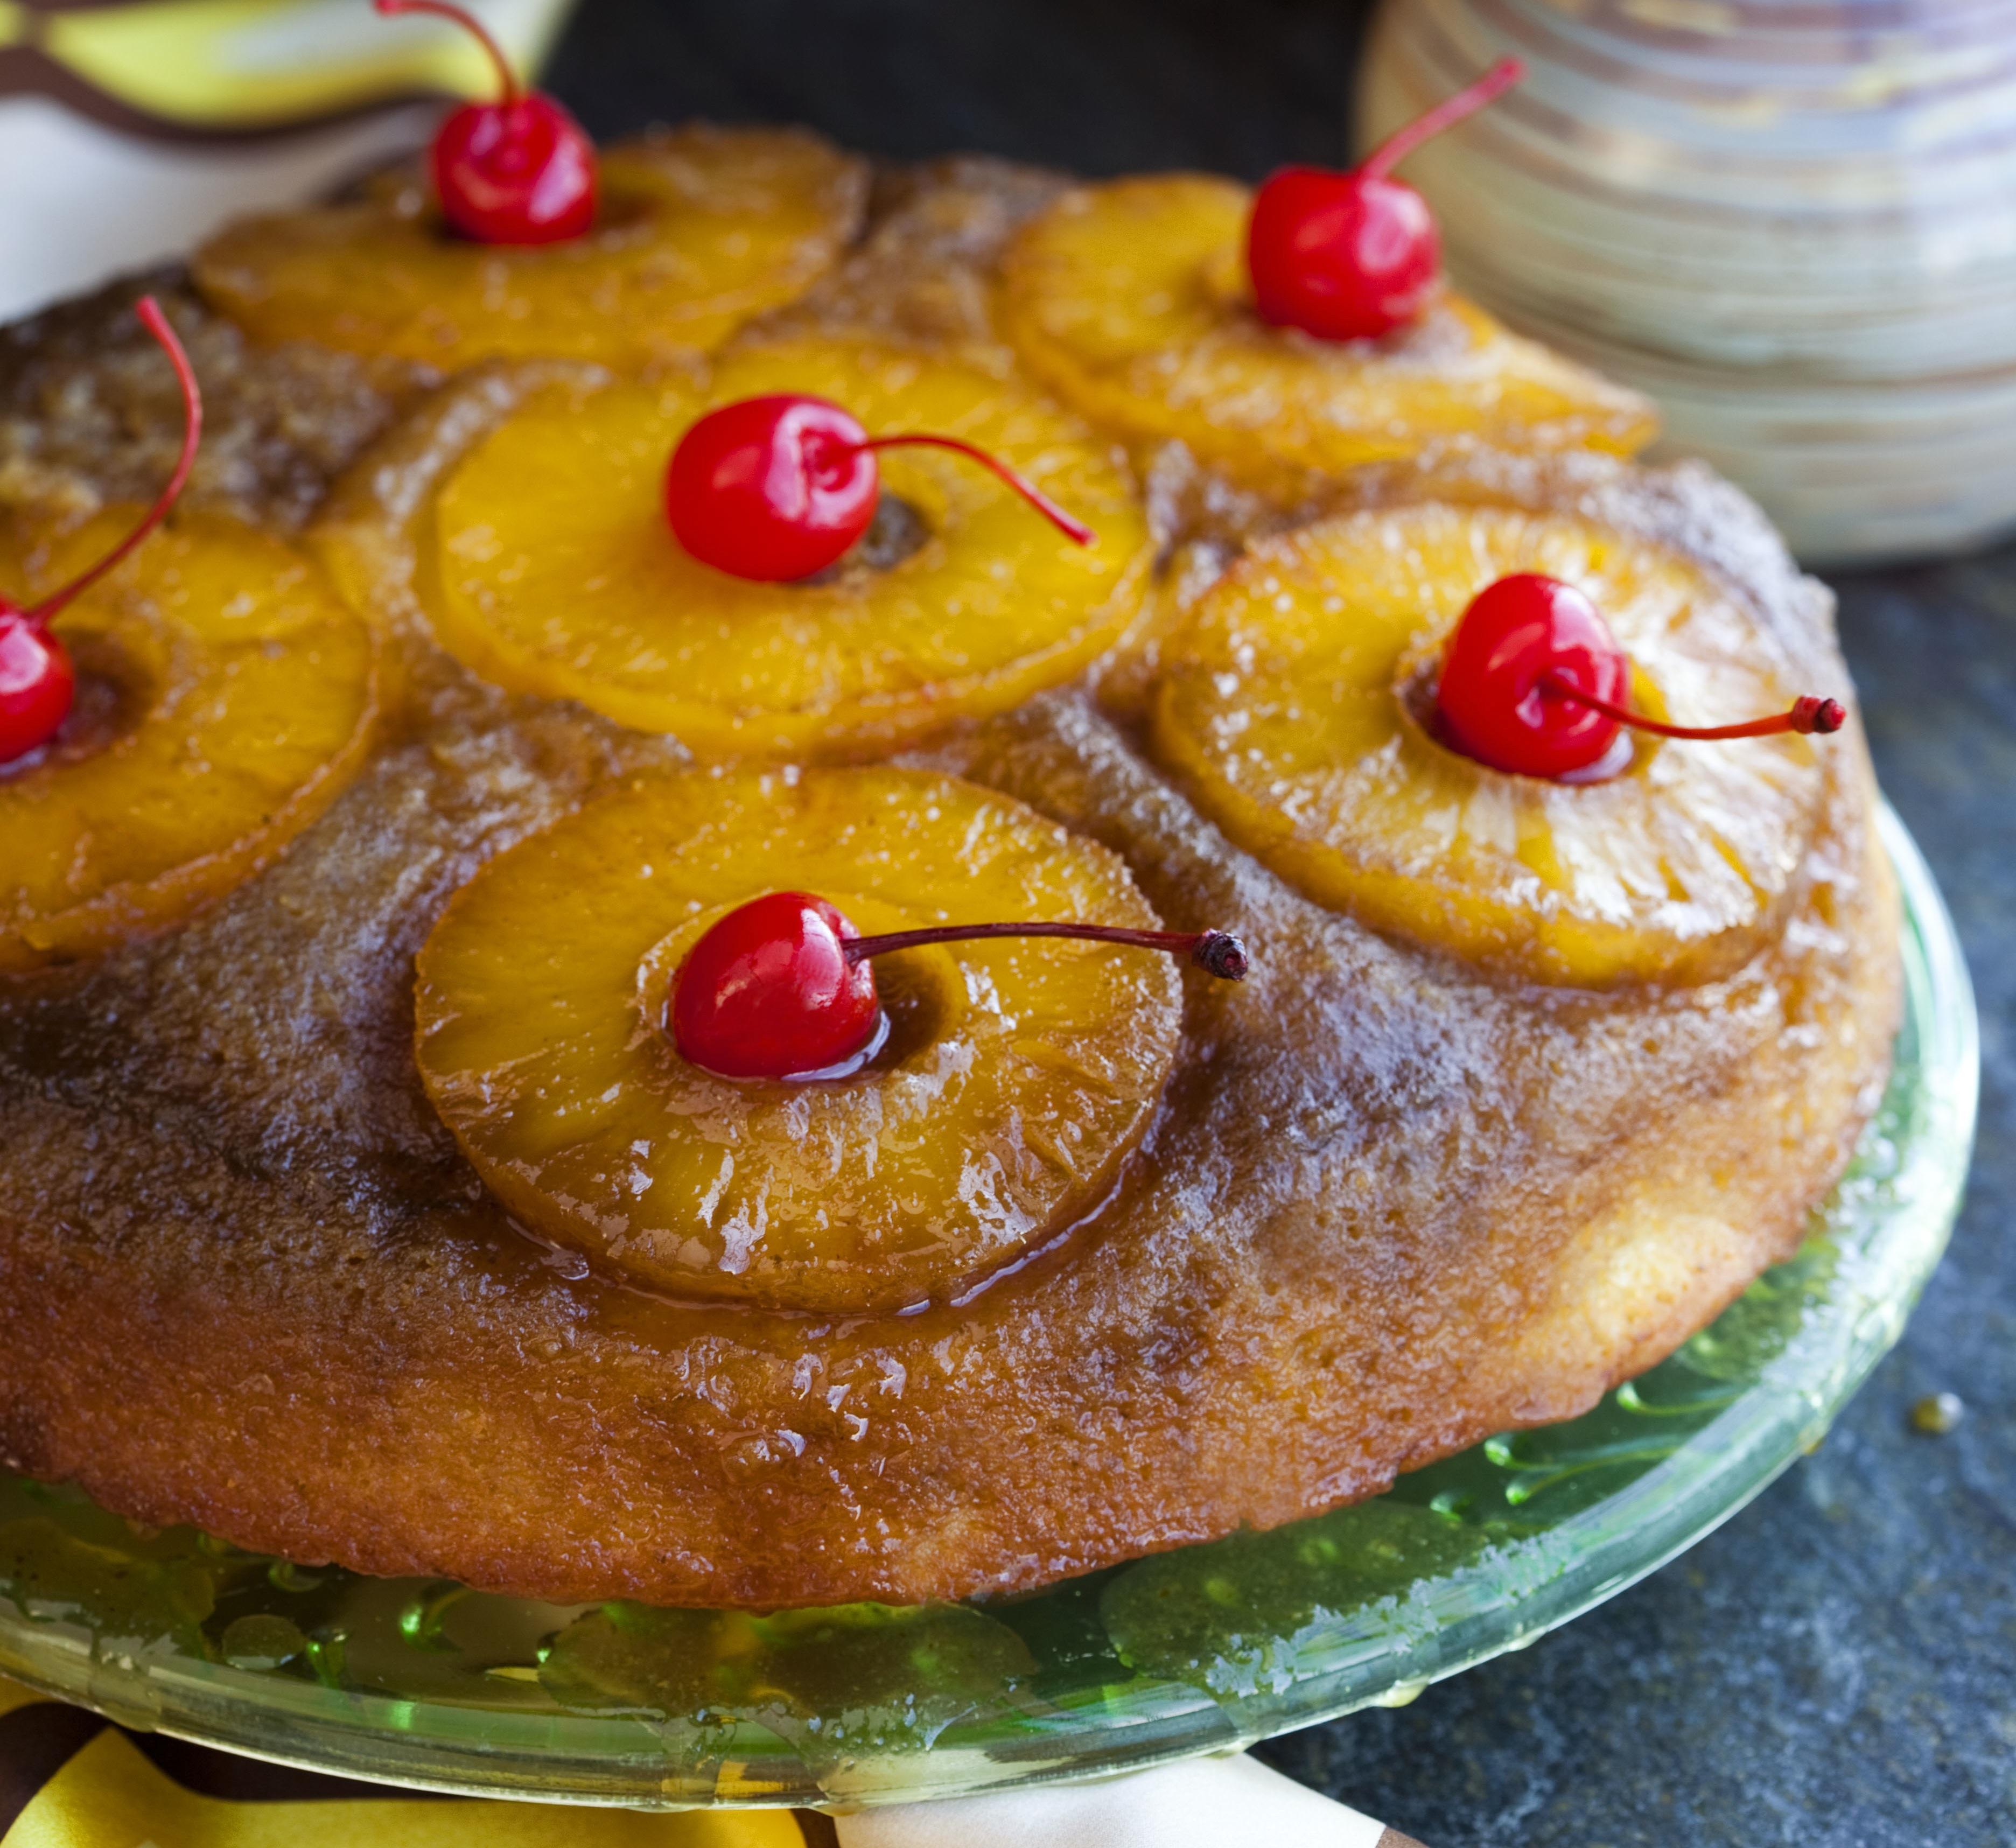 Pineapple Express Upside Down Cake - Food Republic